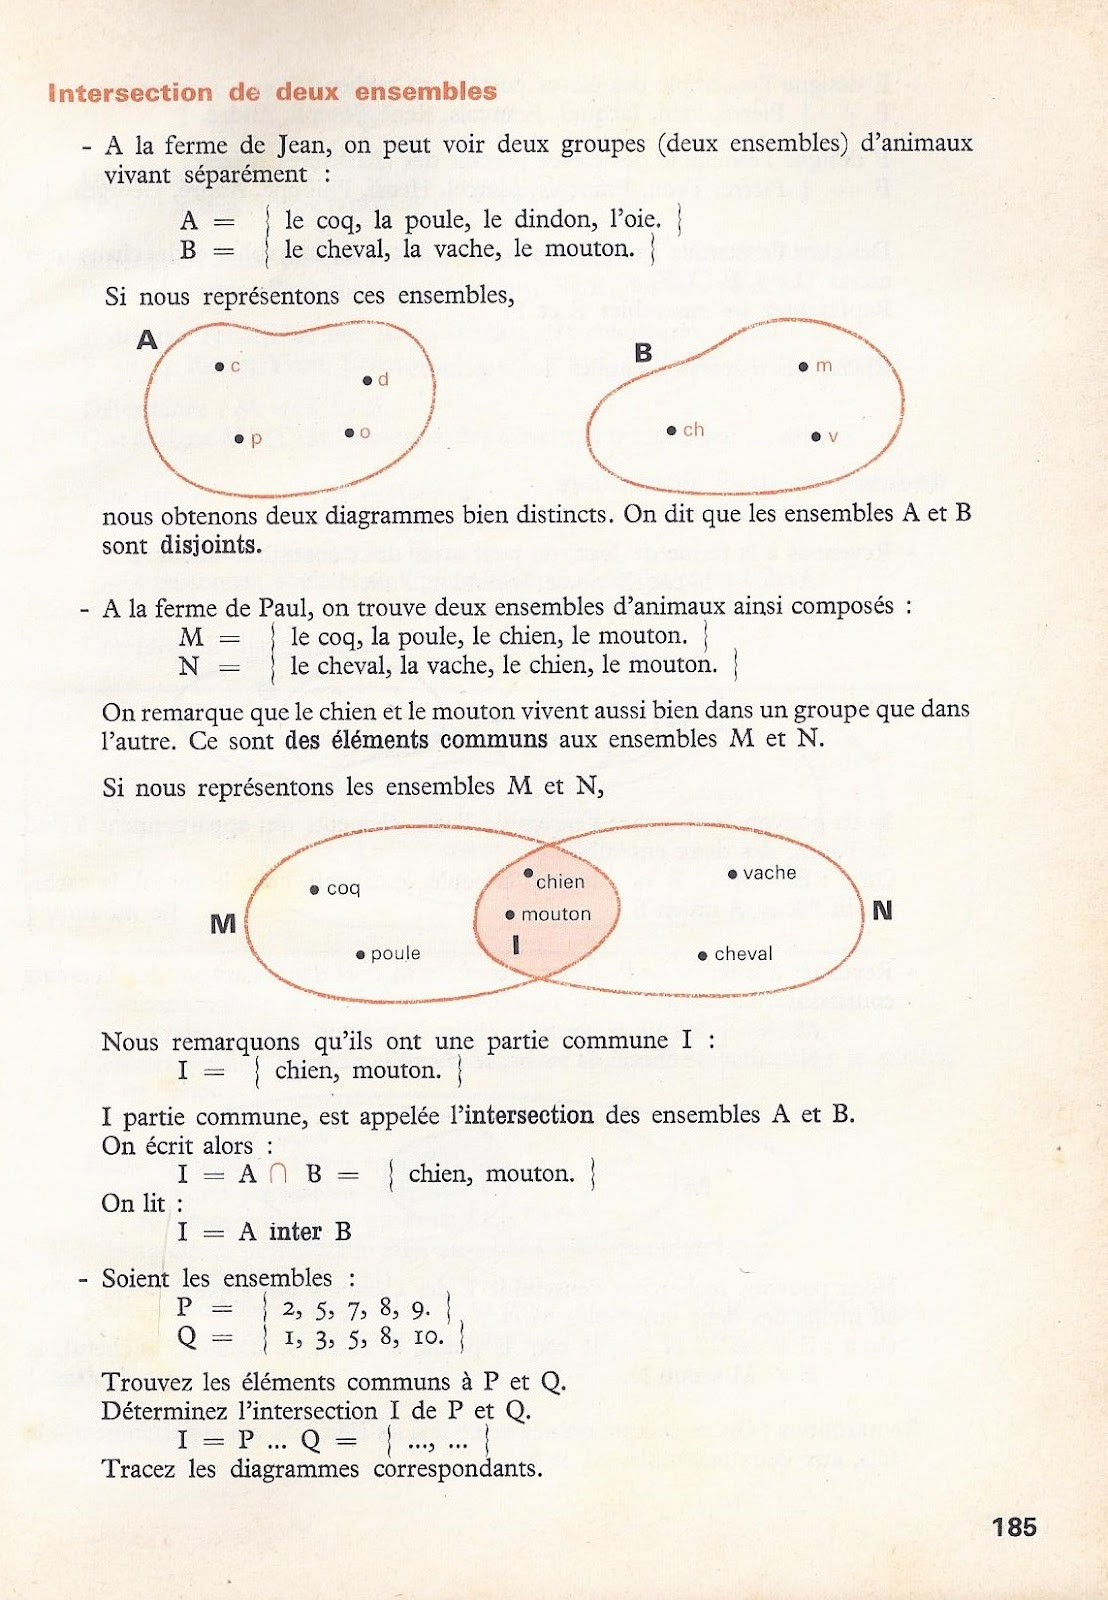 Manuels Anciens Benhaim Nadaud Calcul Jour Apres Jour Cm2